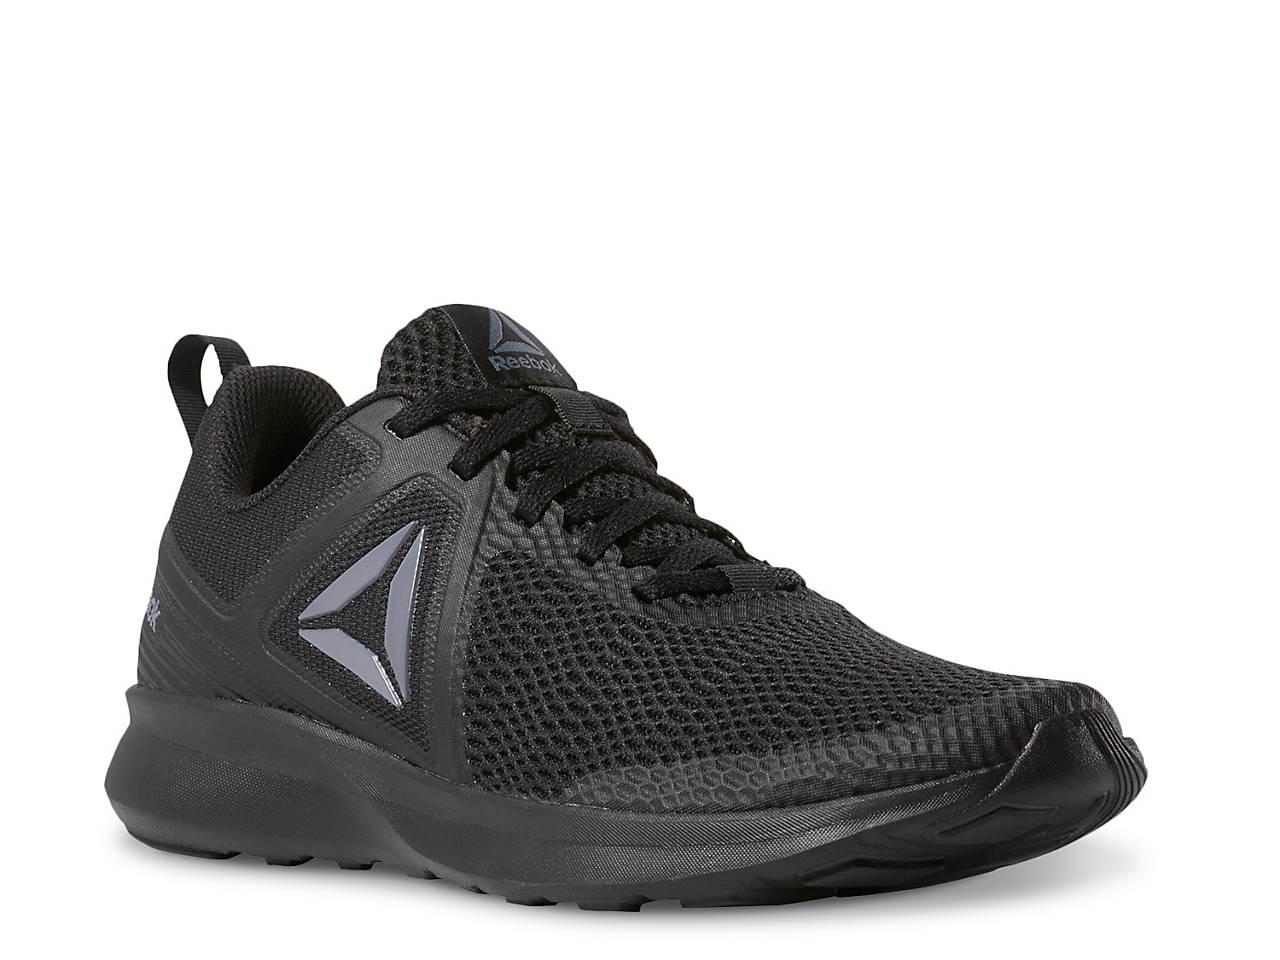 938617d9fa69 Reebok Speed Breeze Running Shoe - Men s Men s Shoes